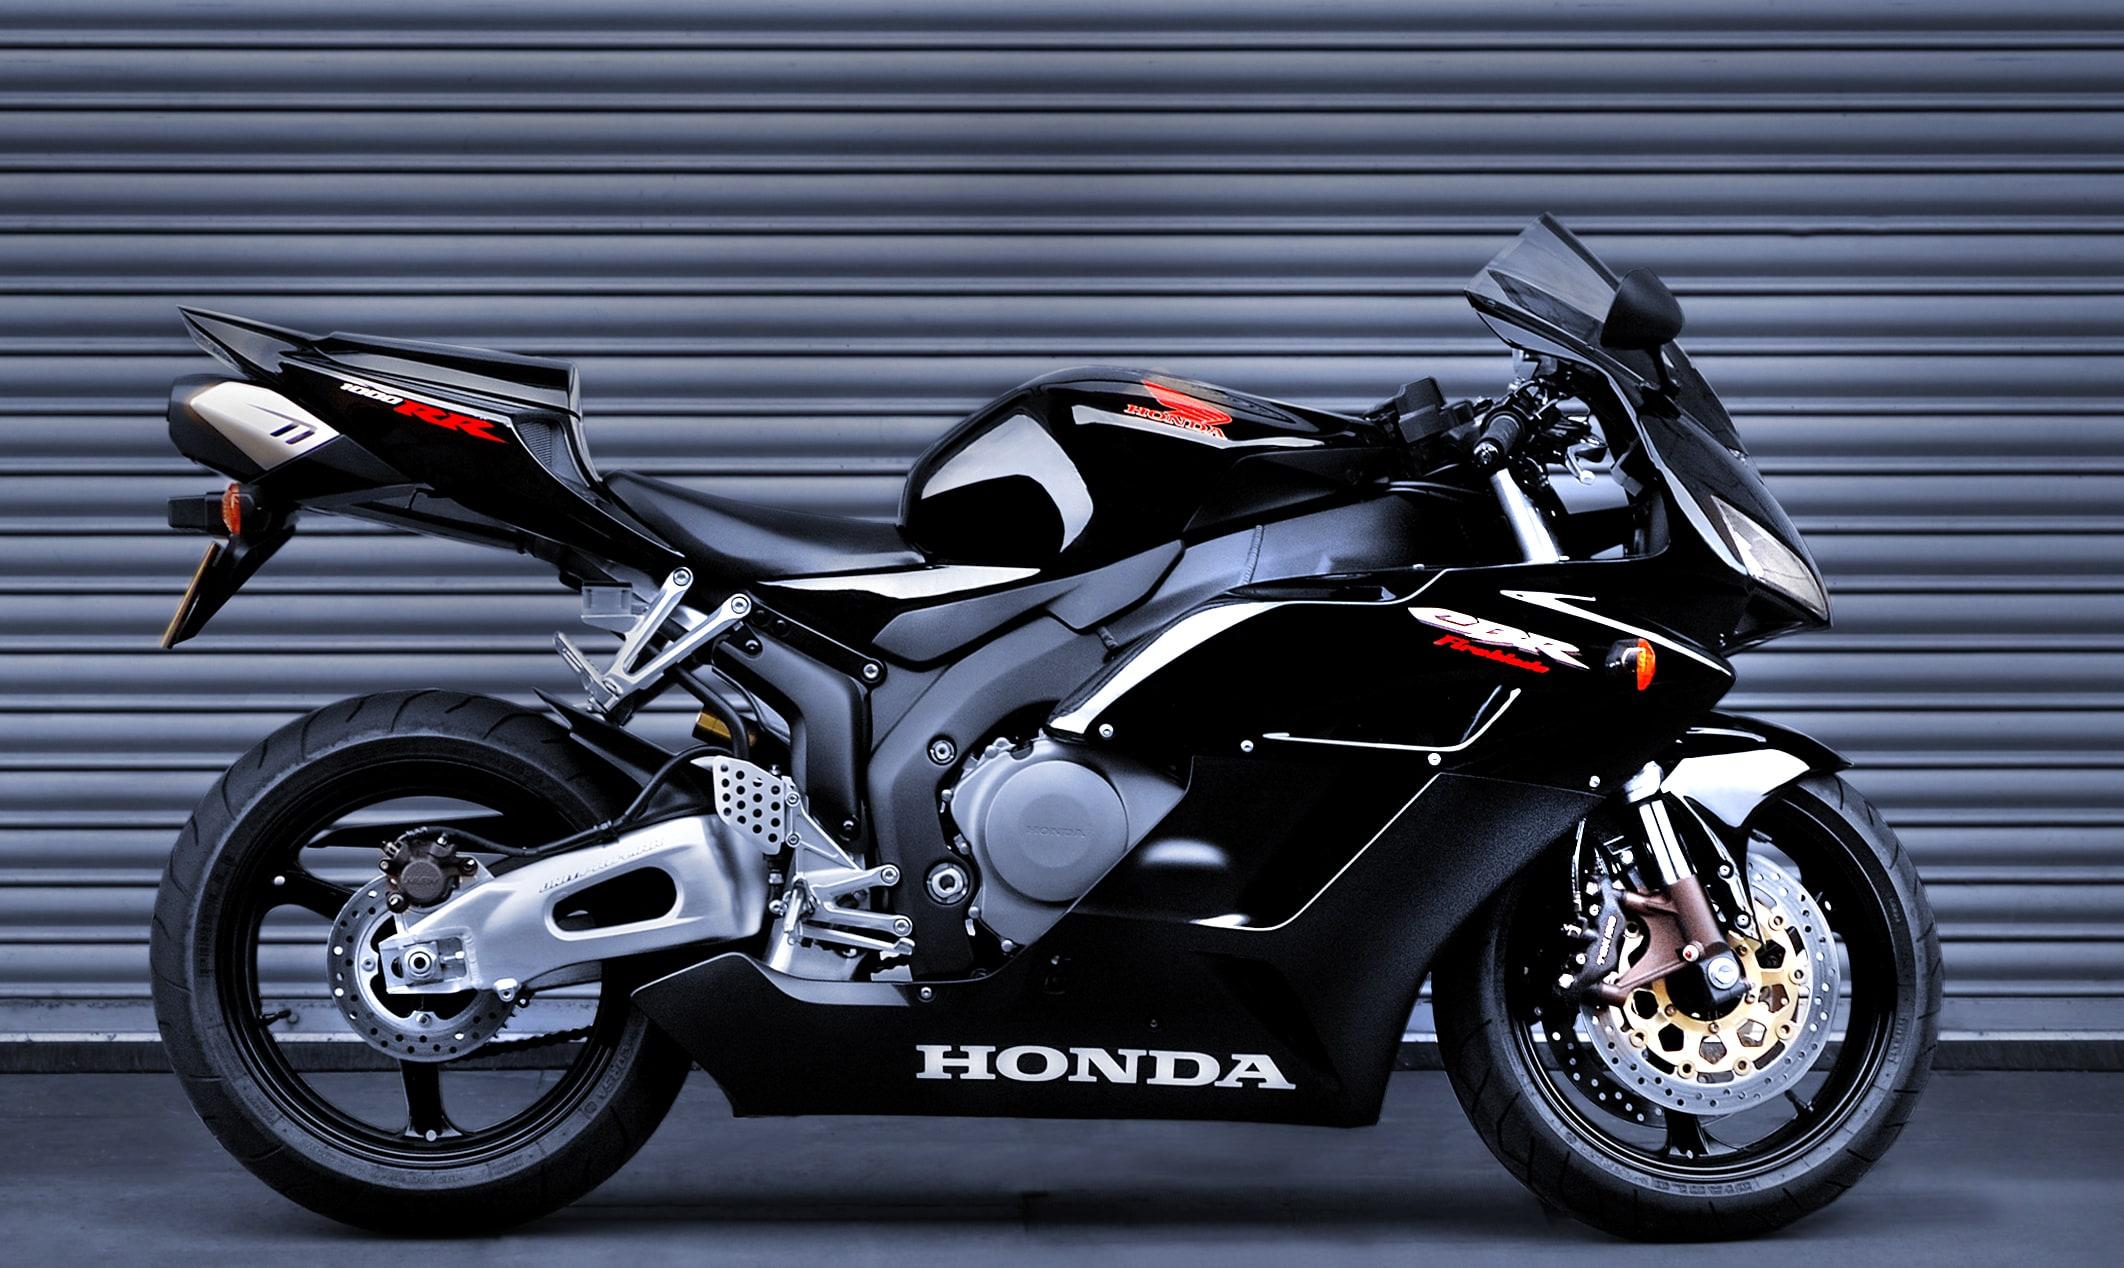 Honda Fireblade CBR by Paul Bussell